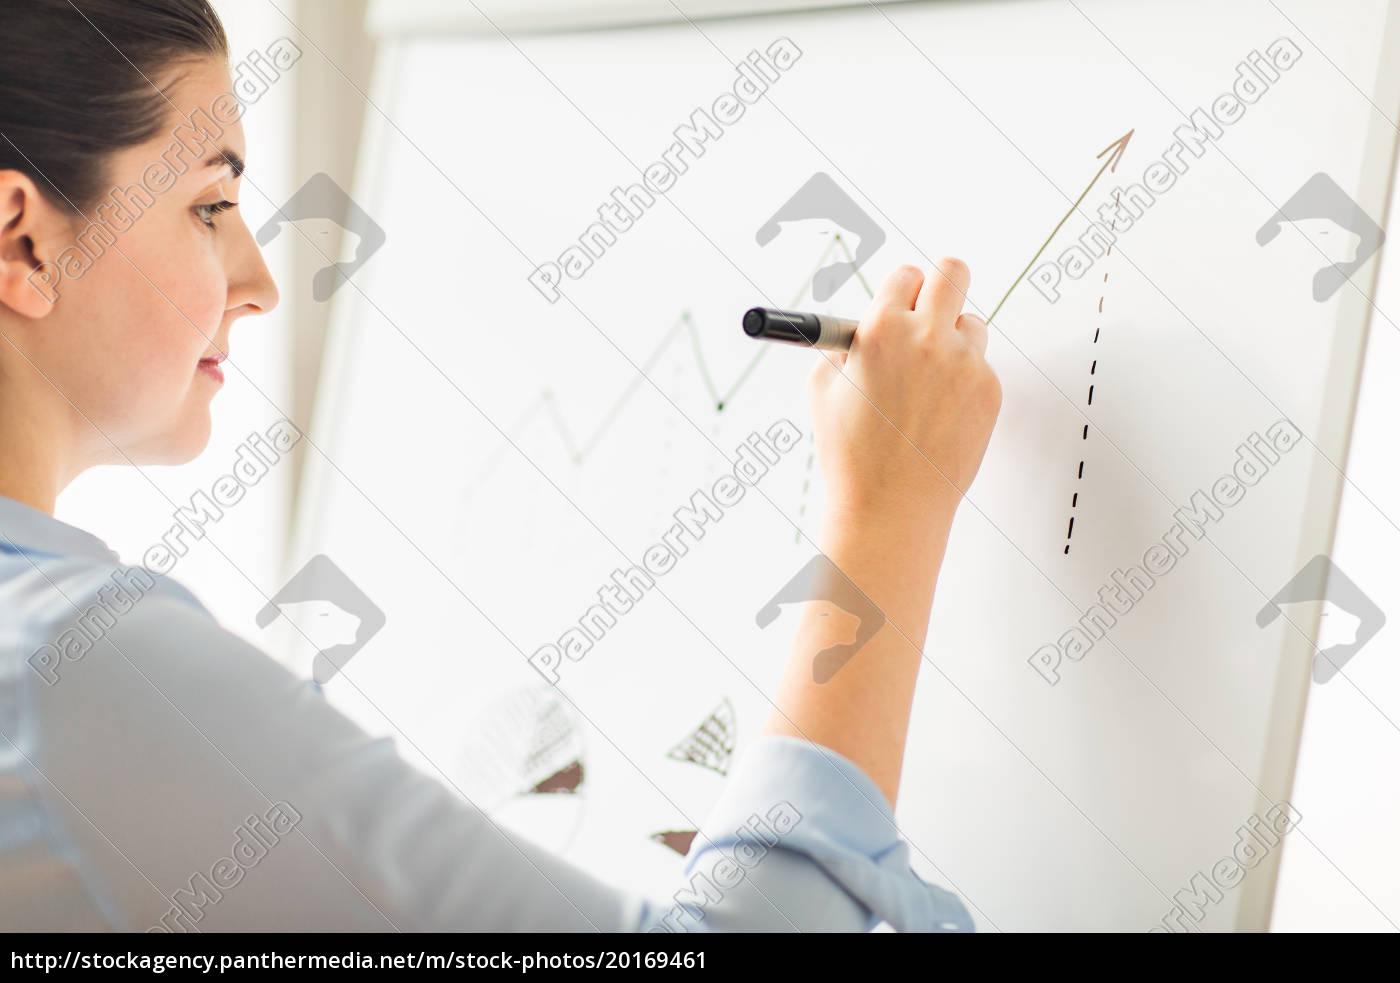 close, up, of, woman, drawing, graph - 20169461